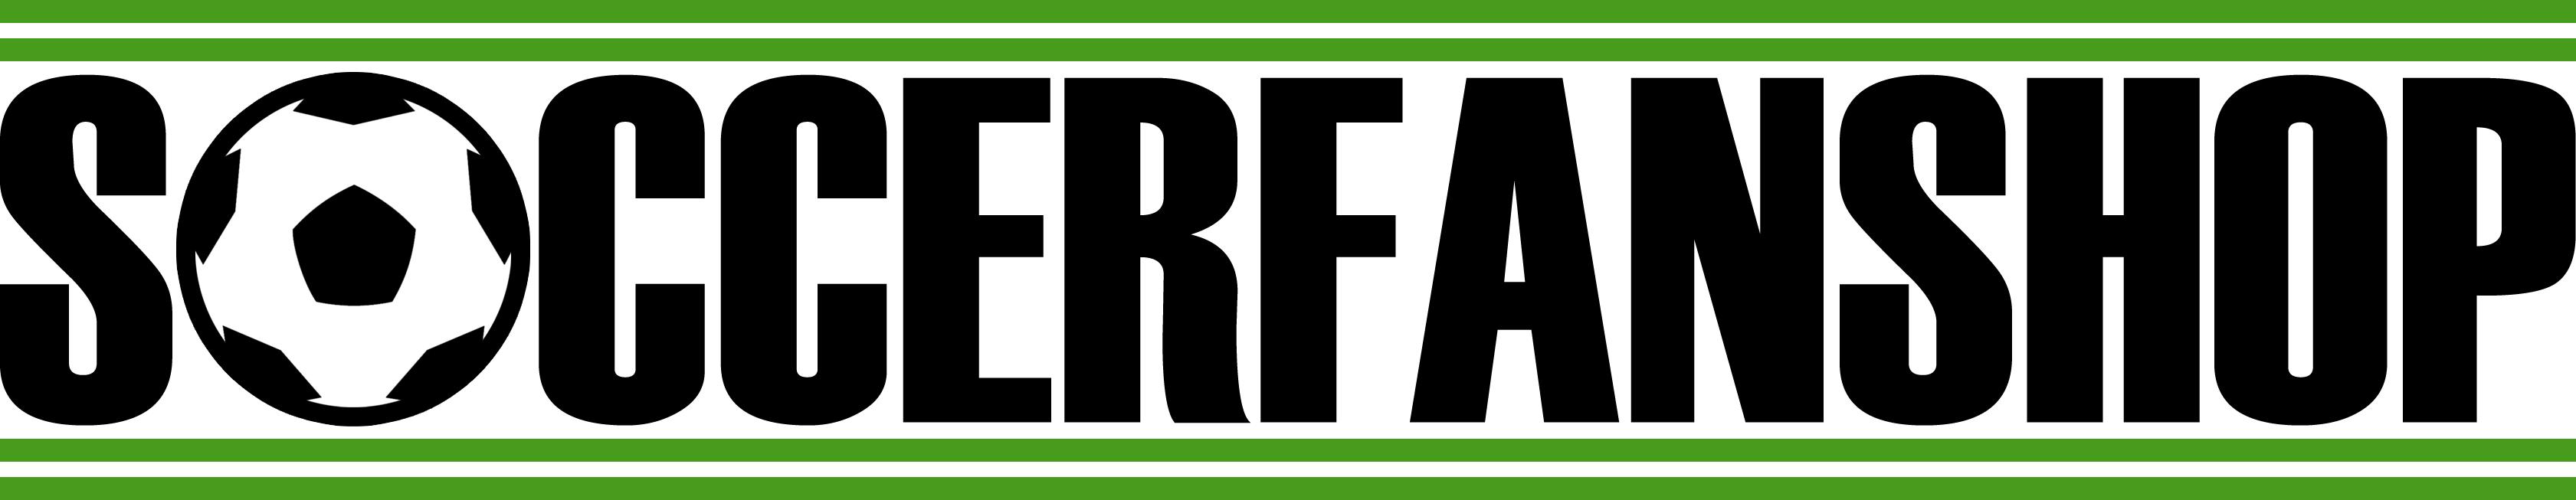 Black Friday Deals Soccerfanshop